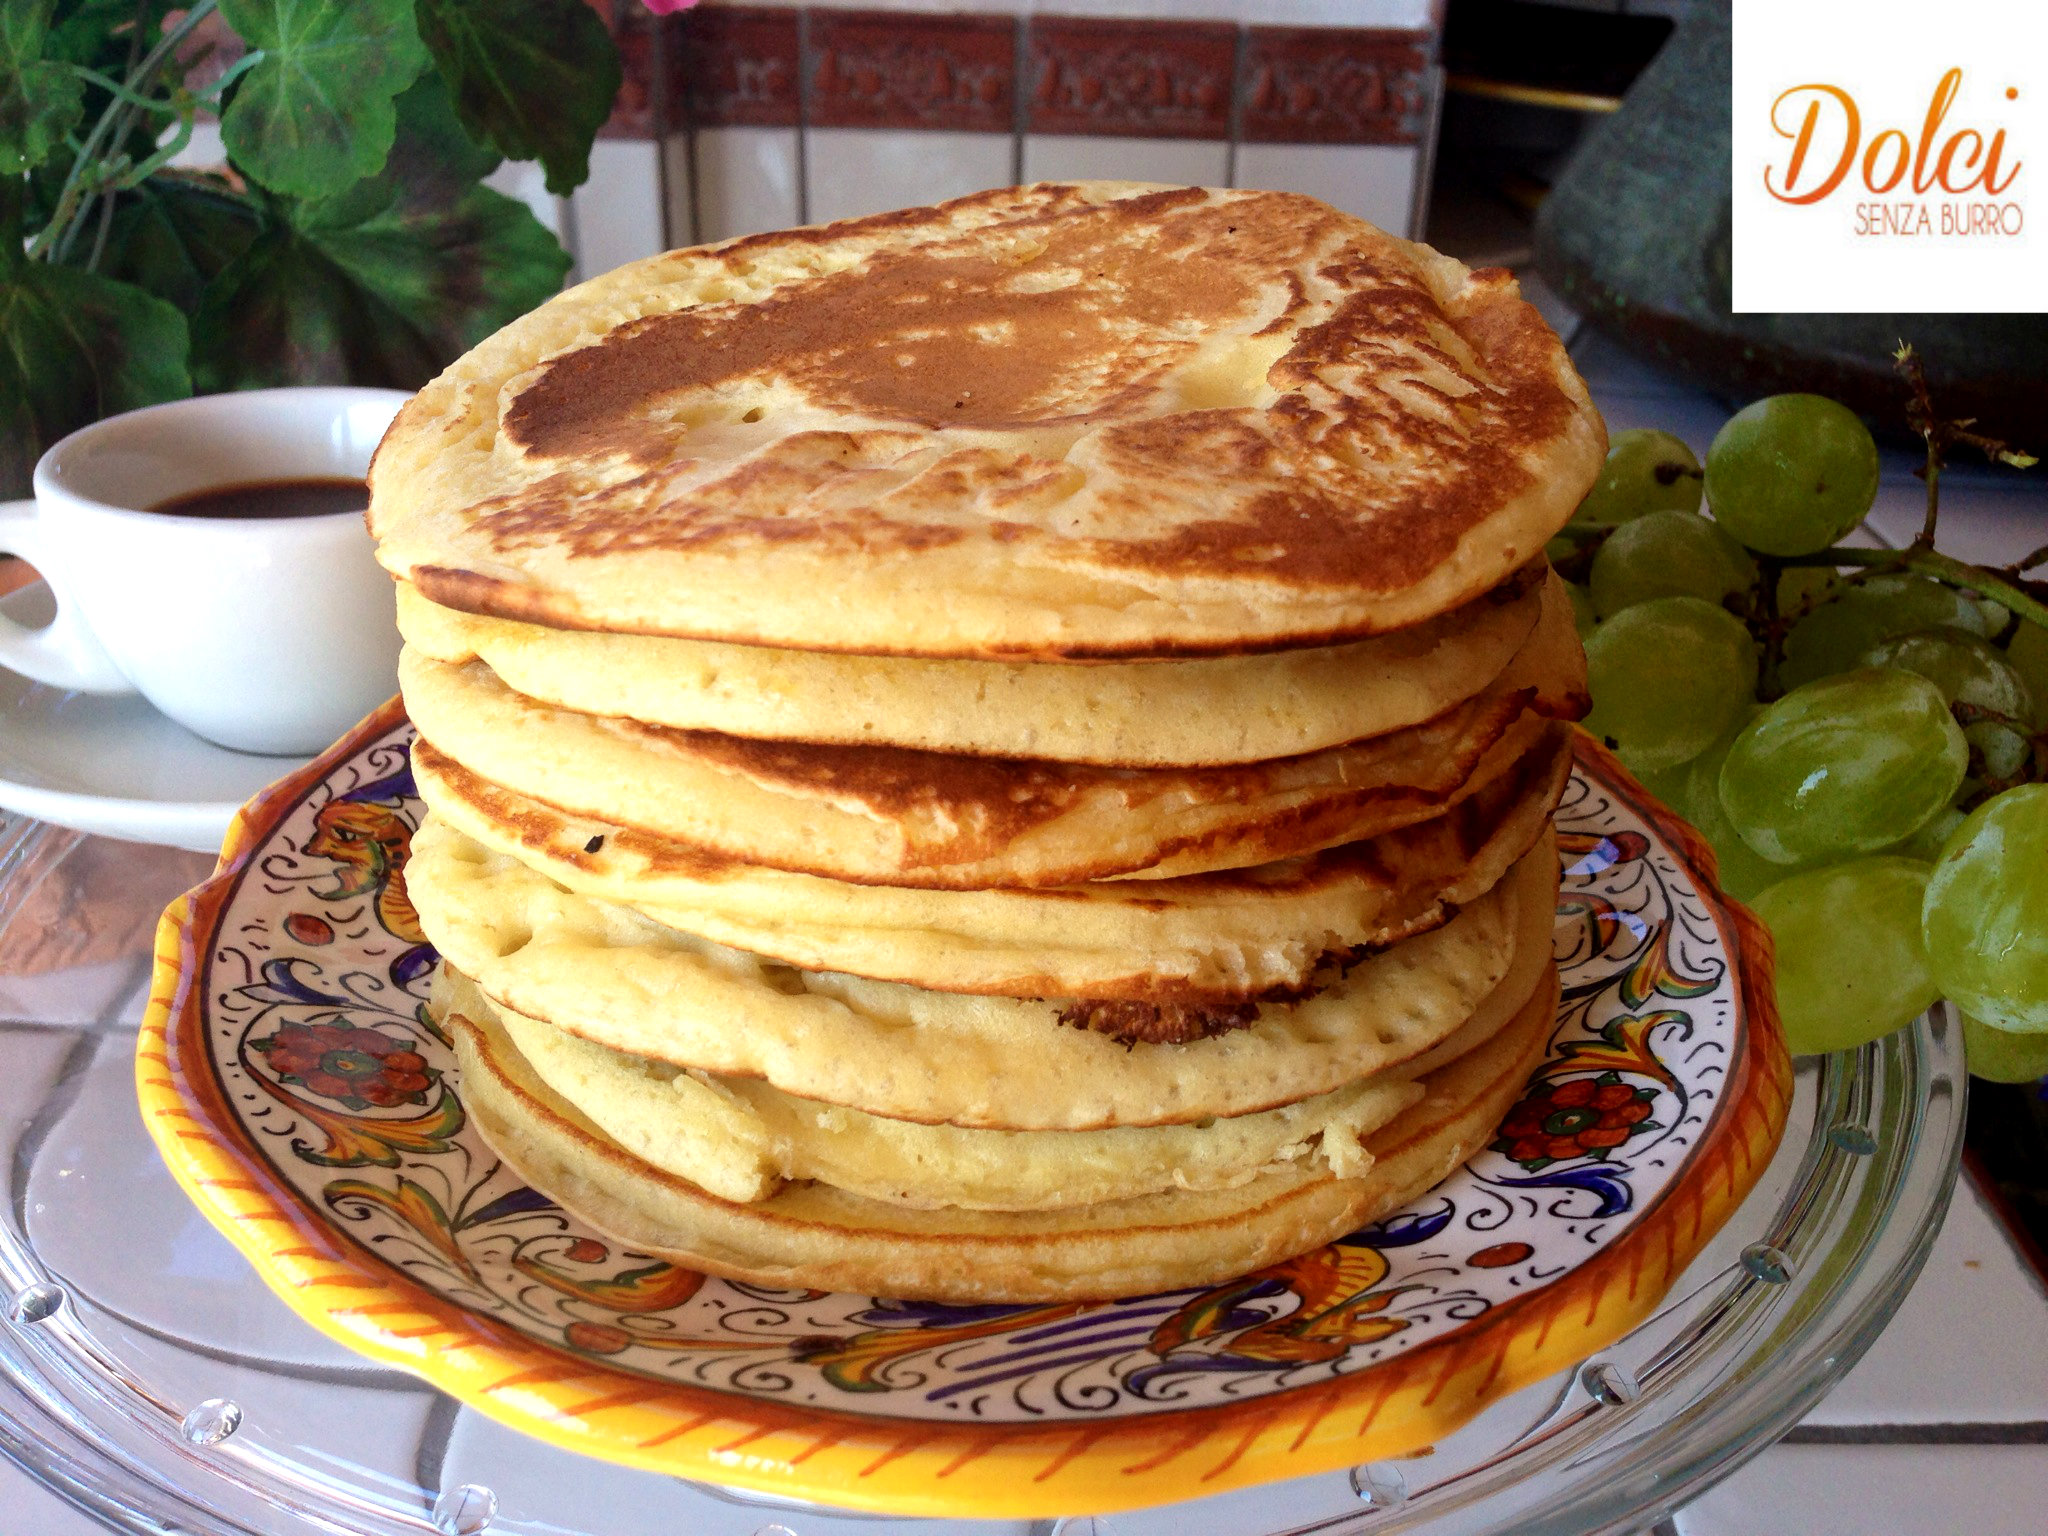 Pancakes Senza Burro, le golose frittelle americane di dolci senza burro